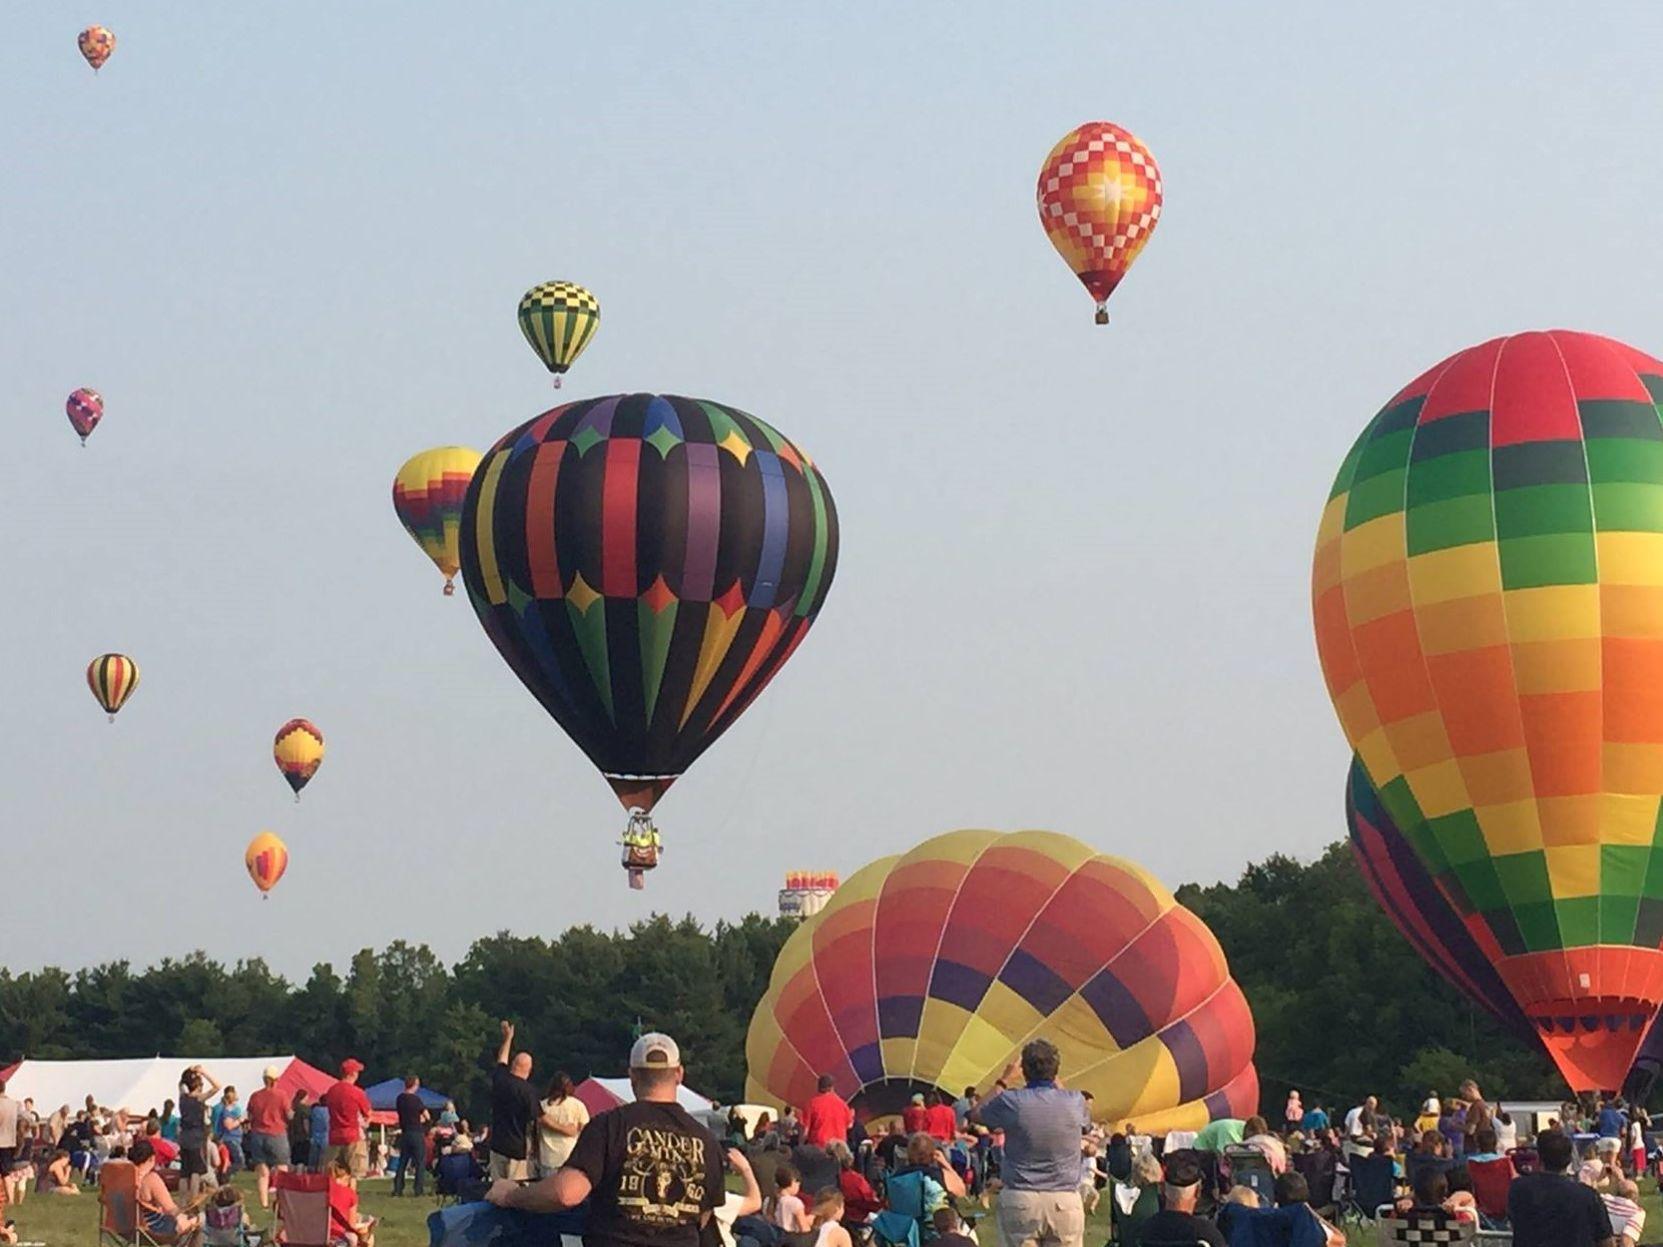 Ashland BalloonFest Flyover set for Saturday evening and Sunday morning